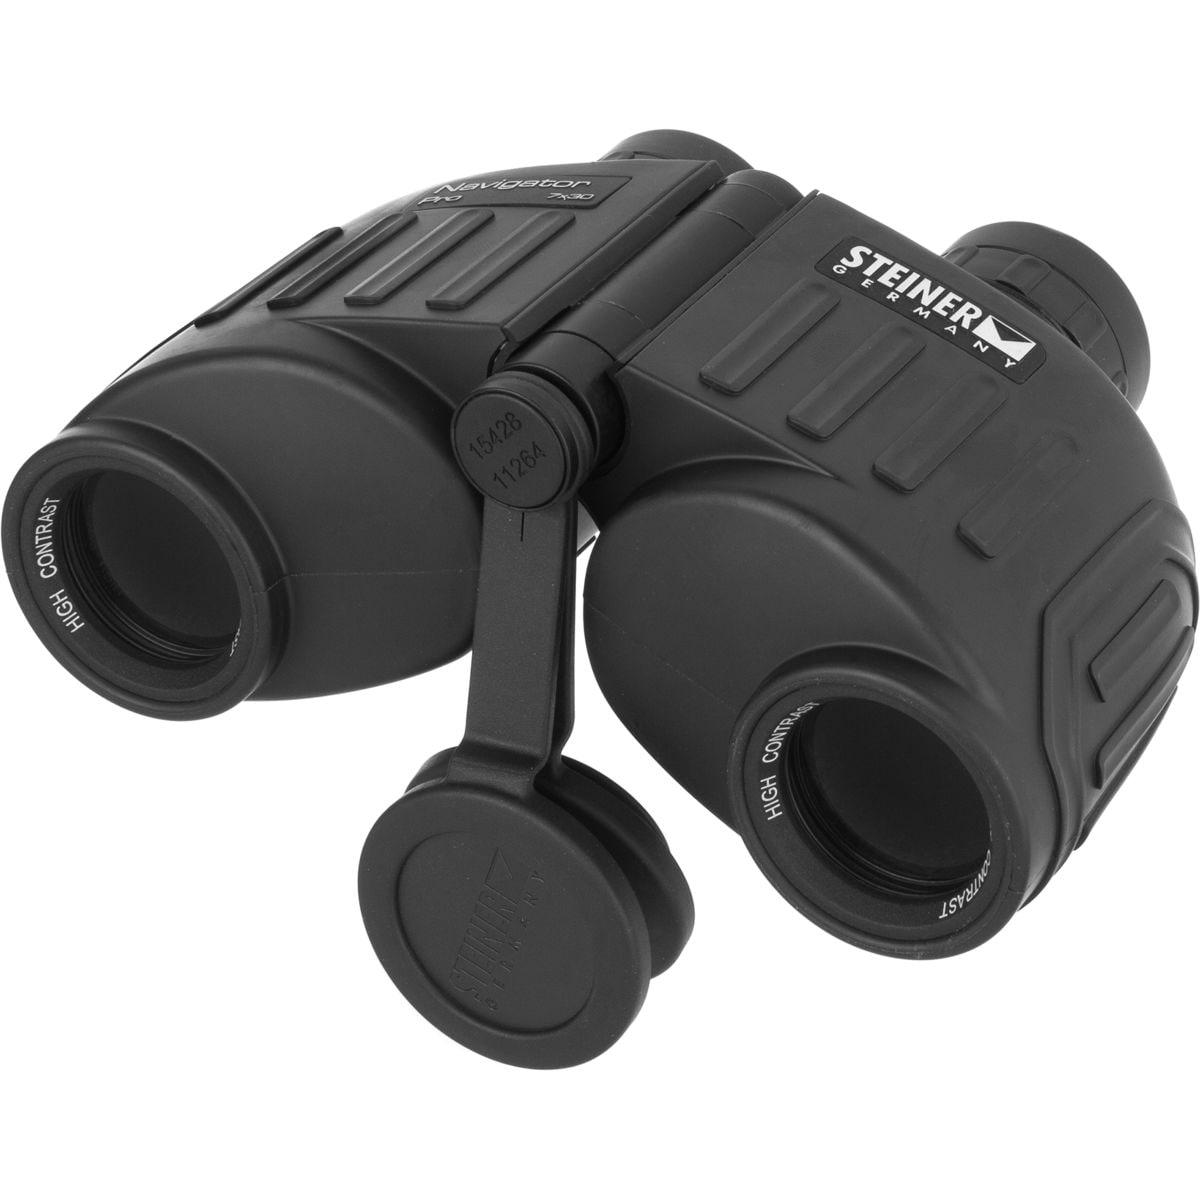 Steiner 7x30 Navigator Pro Binoculars